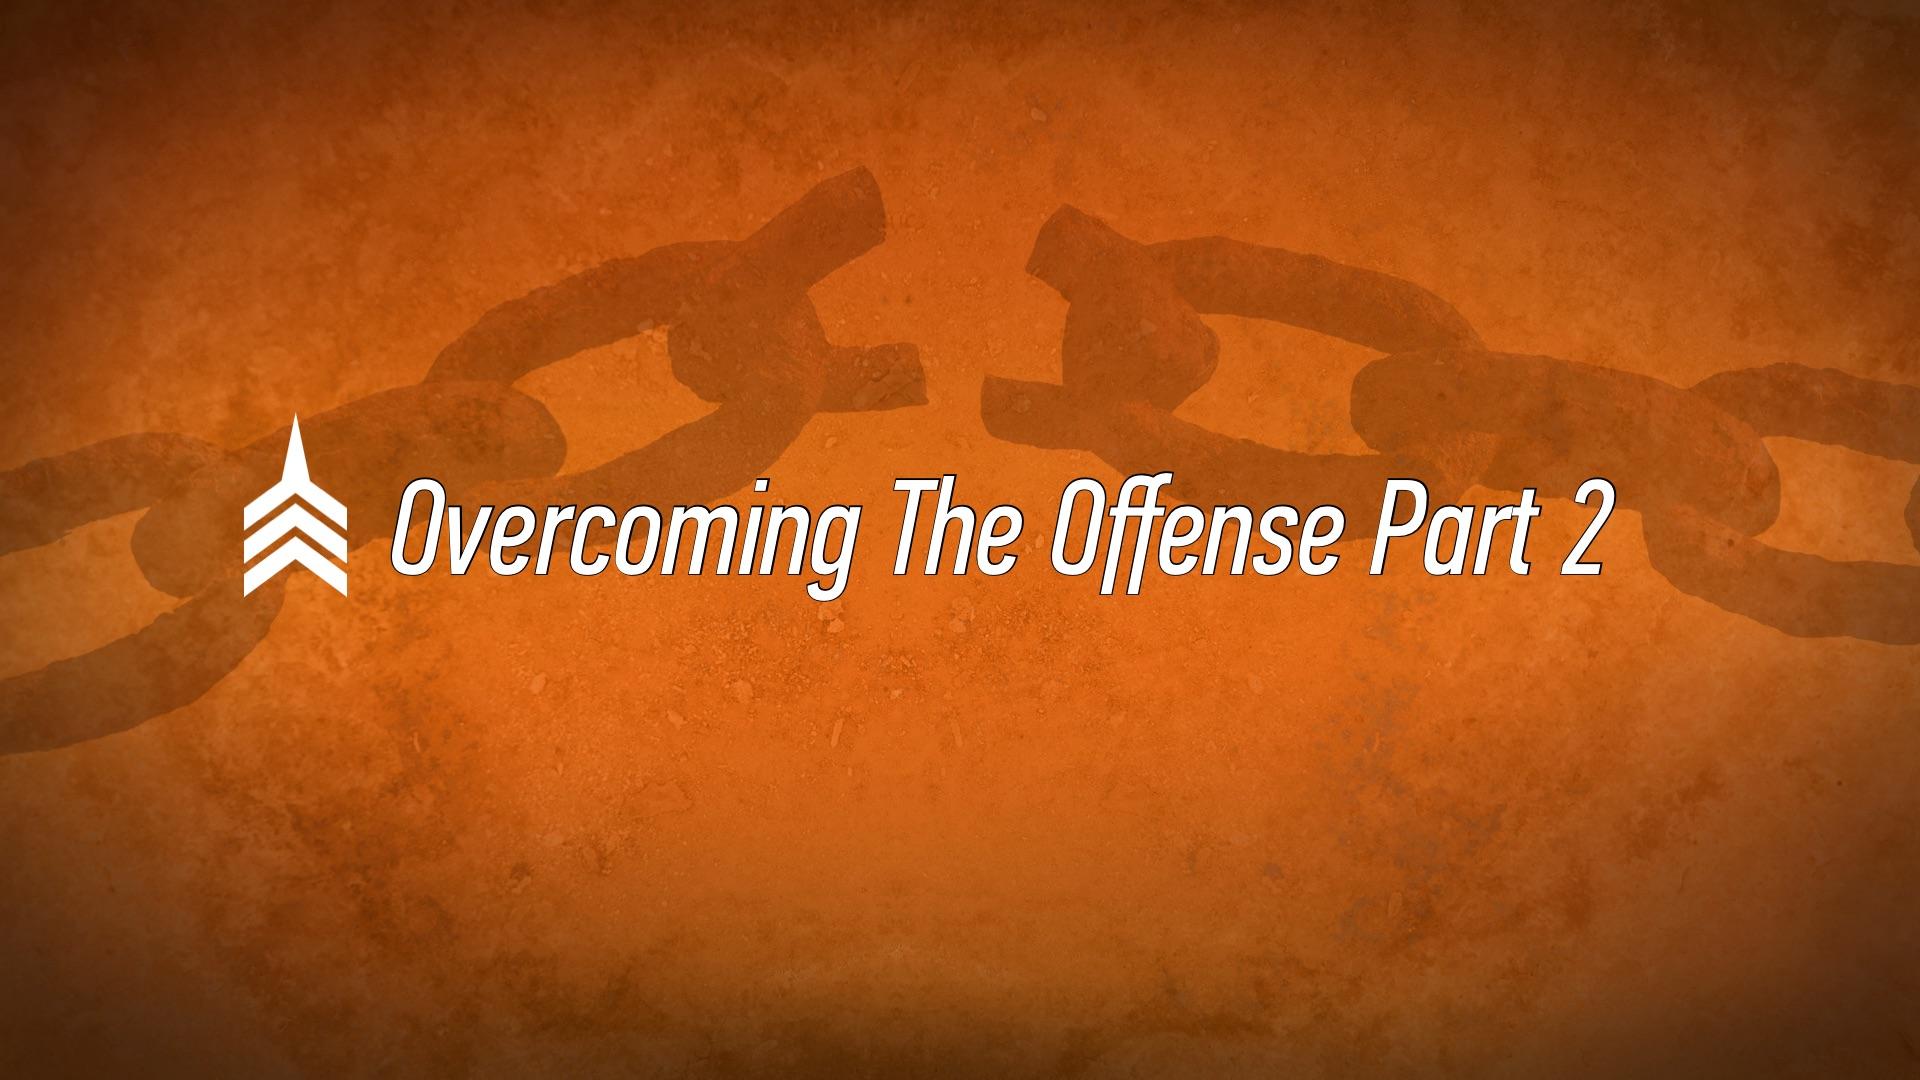 20170702 Overcoming The Offense Part 2.jpg